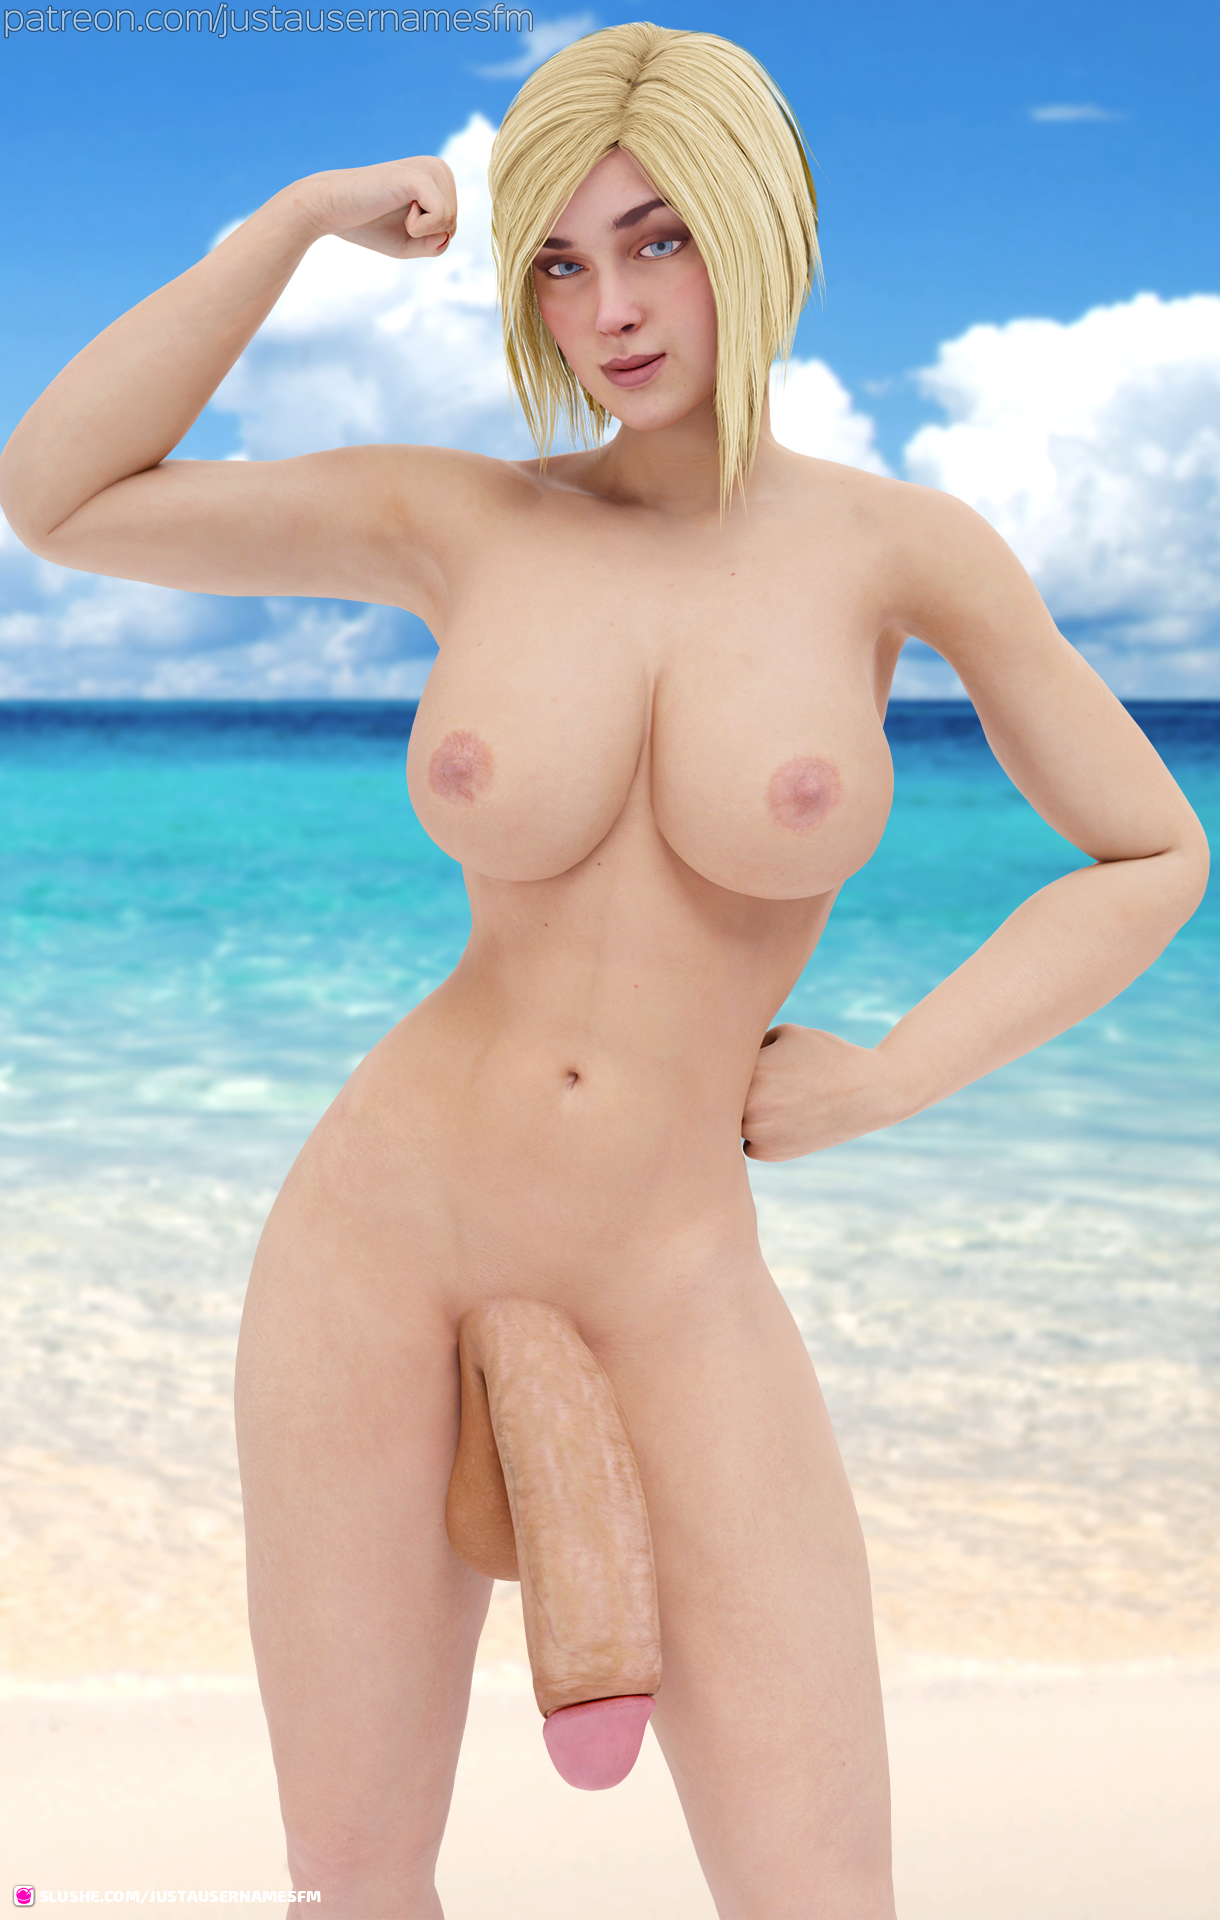 Power Girl at the beach